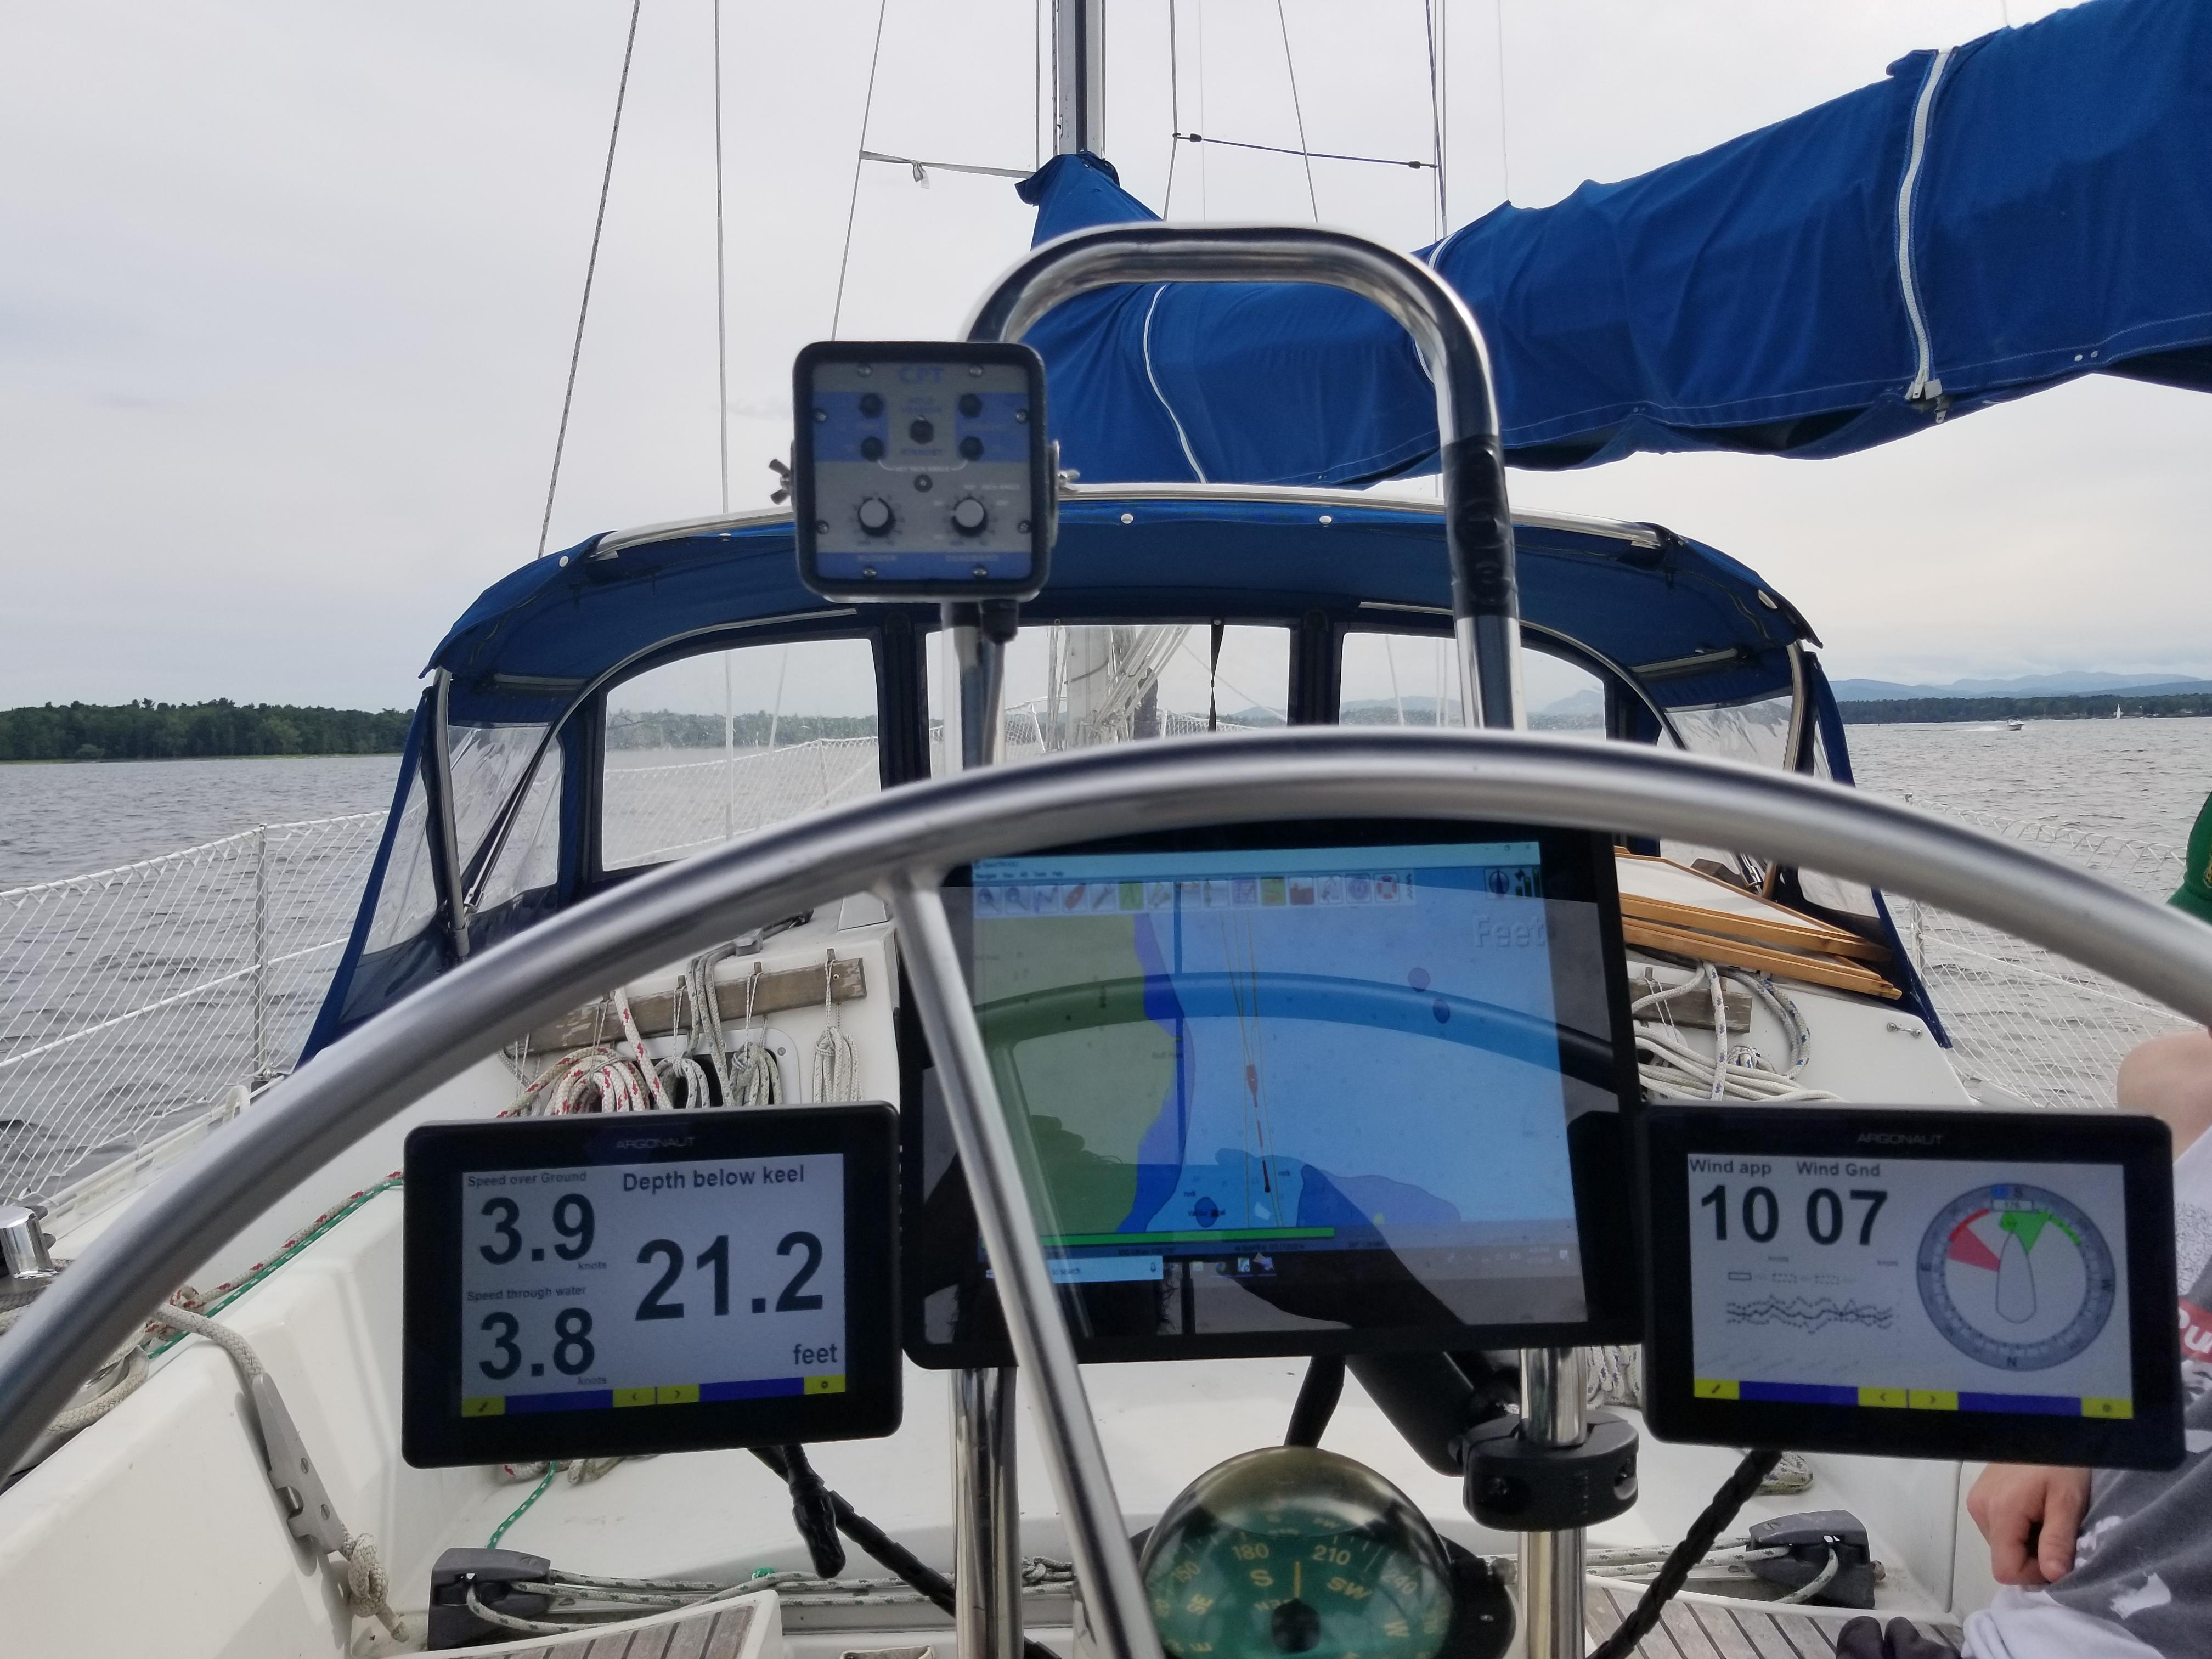 DIY Boat instruments - Cruisers & Sailing Forums